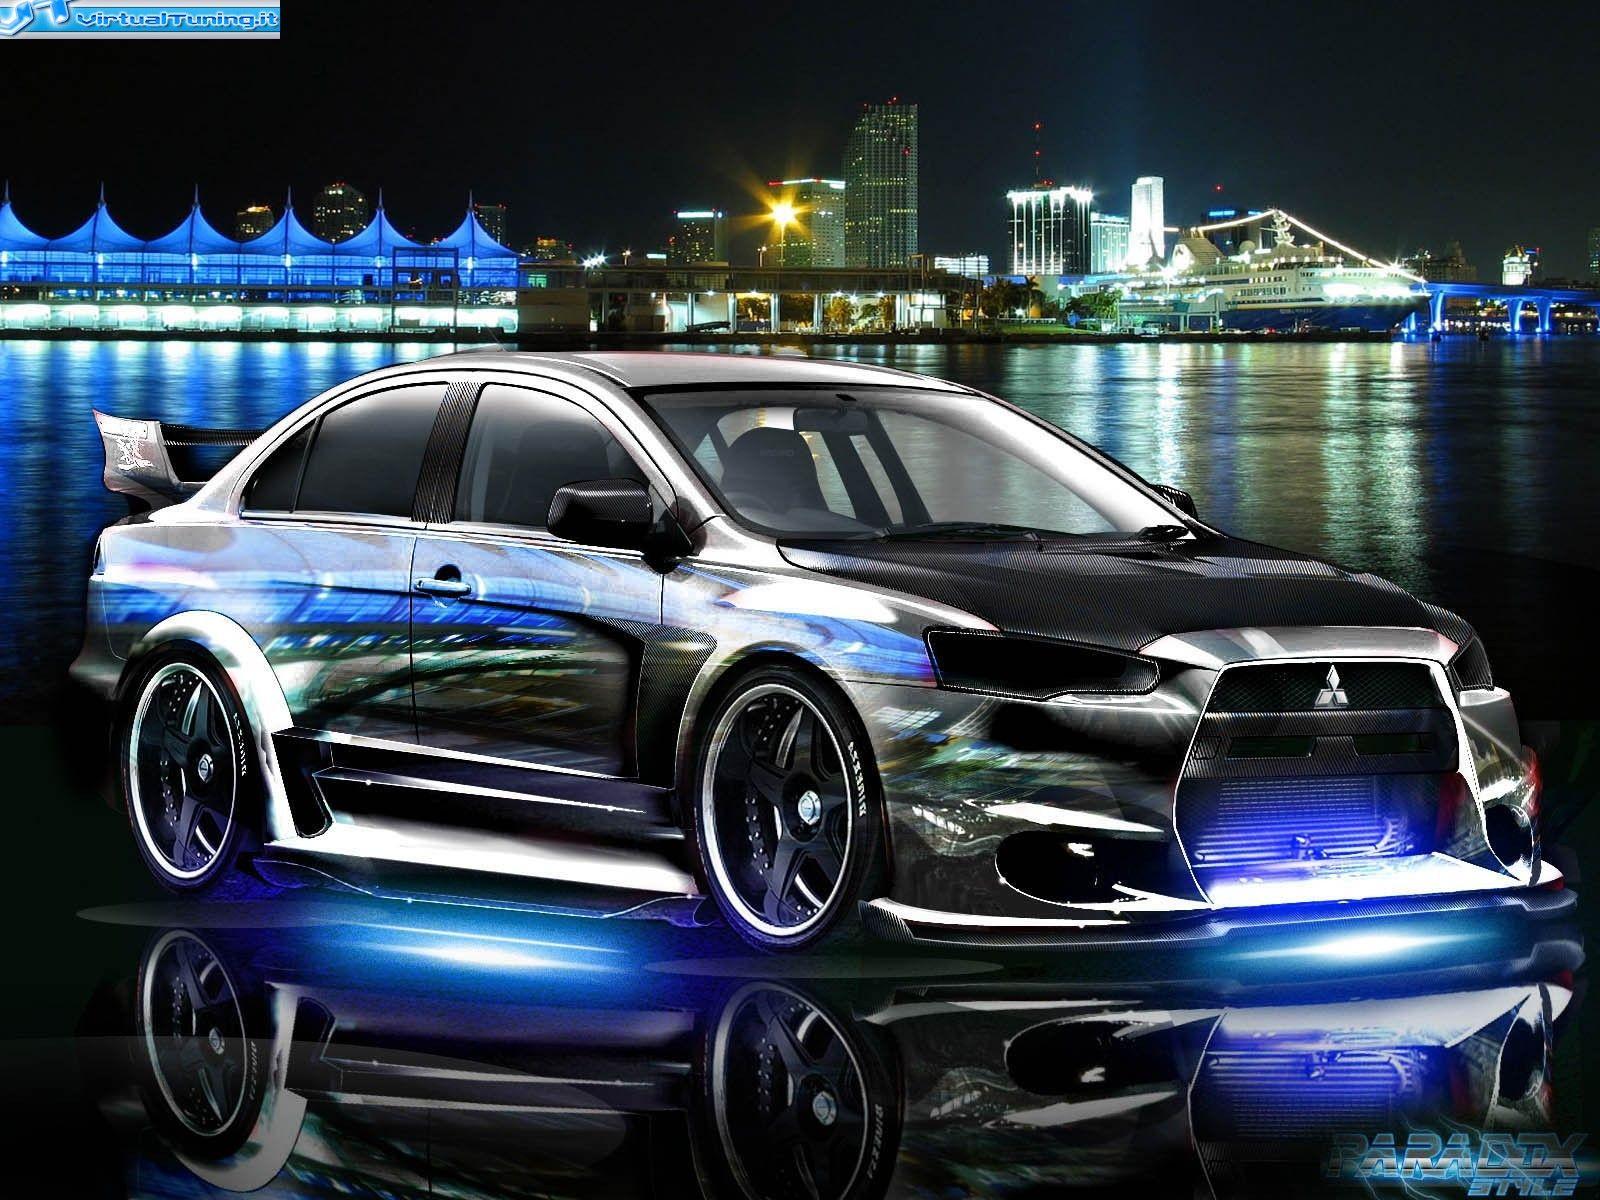 Las Mejores Imagenes 3d Mitsubishi Lancer Mitsubishi Cars Mitsubishi Lancer Evolution